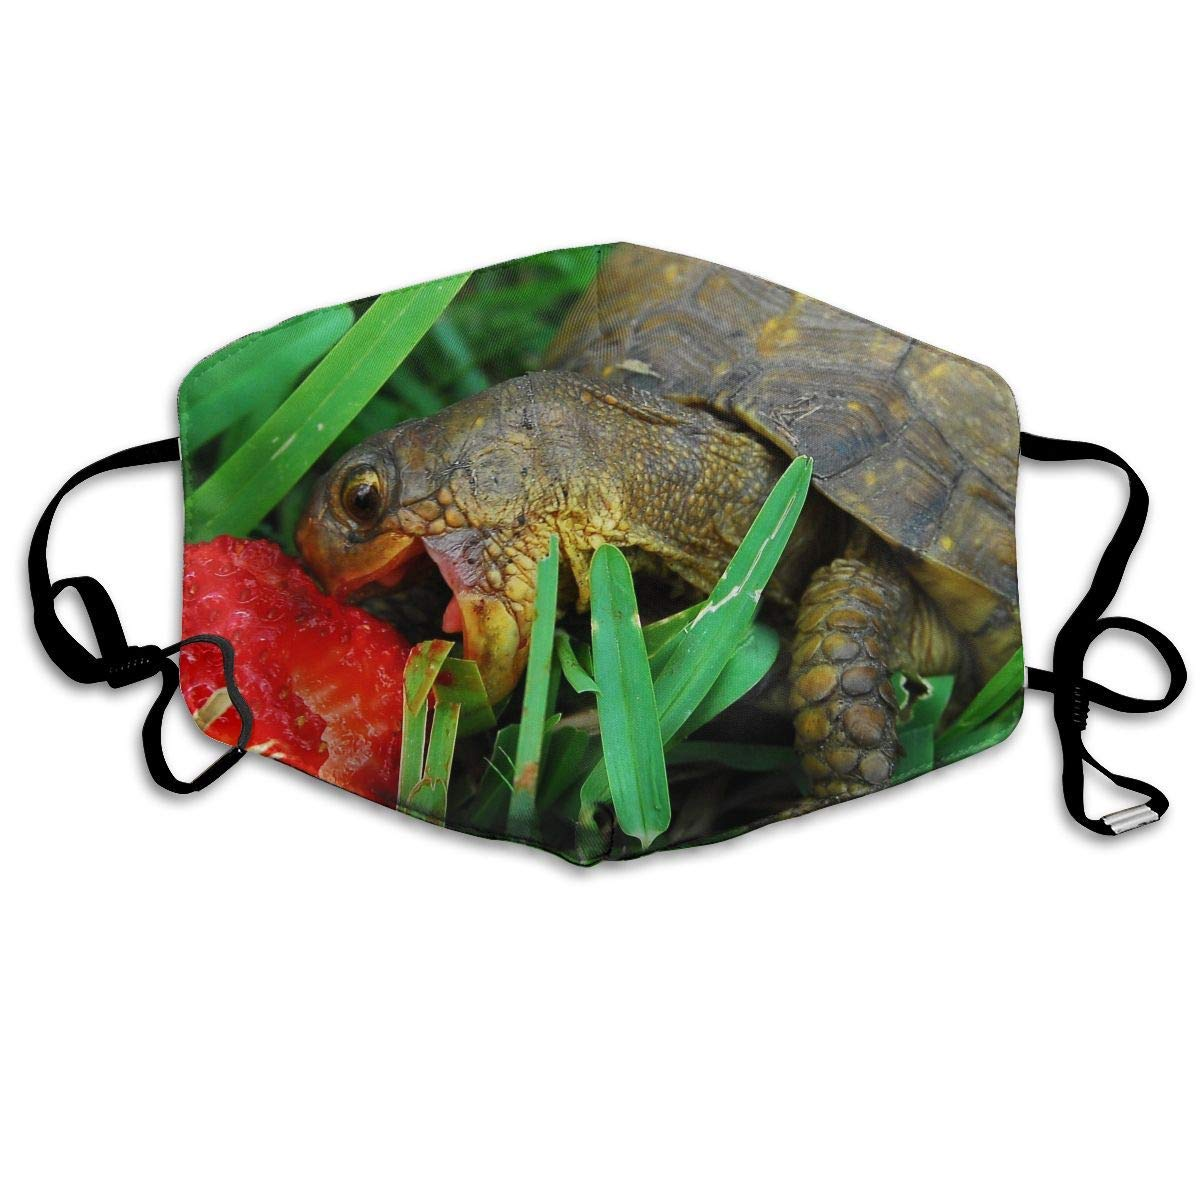 Daawqee Máscara de Boca, Turtle Eat Strawberries Green Grass Unisex Creative Mascarilla Washable Safety 100% Polyester Comfortable Breathable Health Half Face Masks